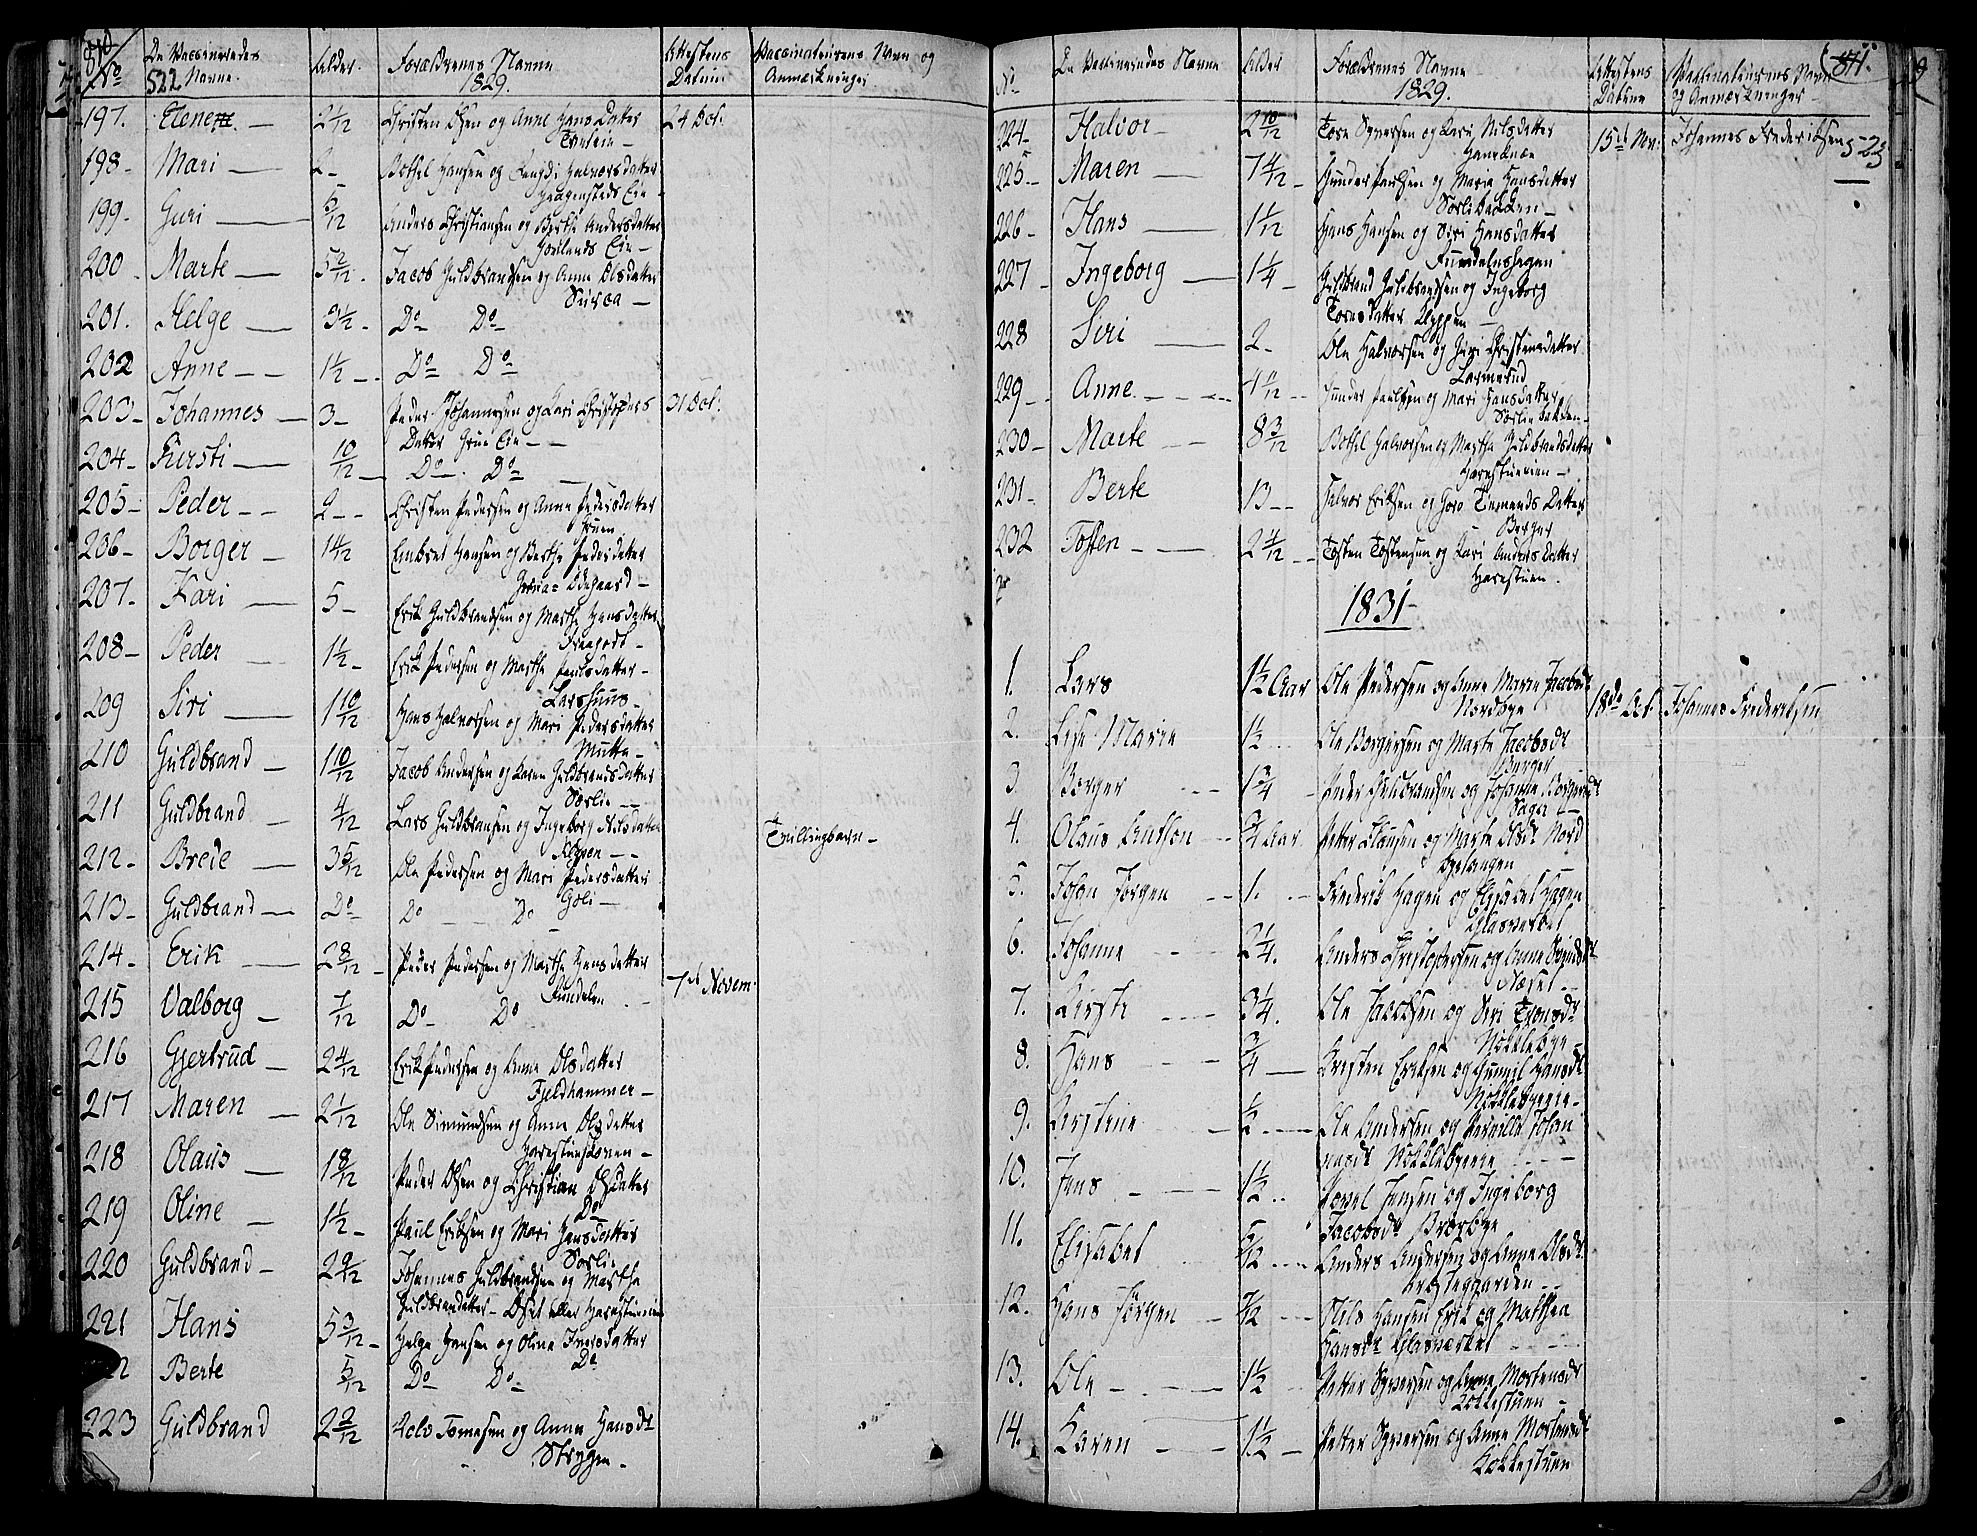 SAH, Jevnaker prestekontor, Ministerialbok nr. 4, 1800-1861, s. 522-523